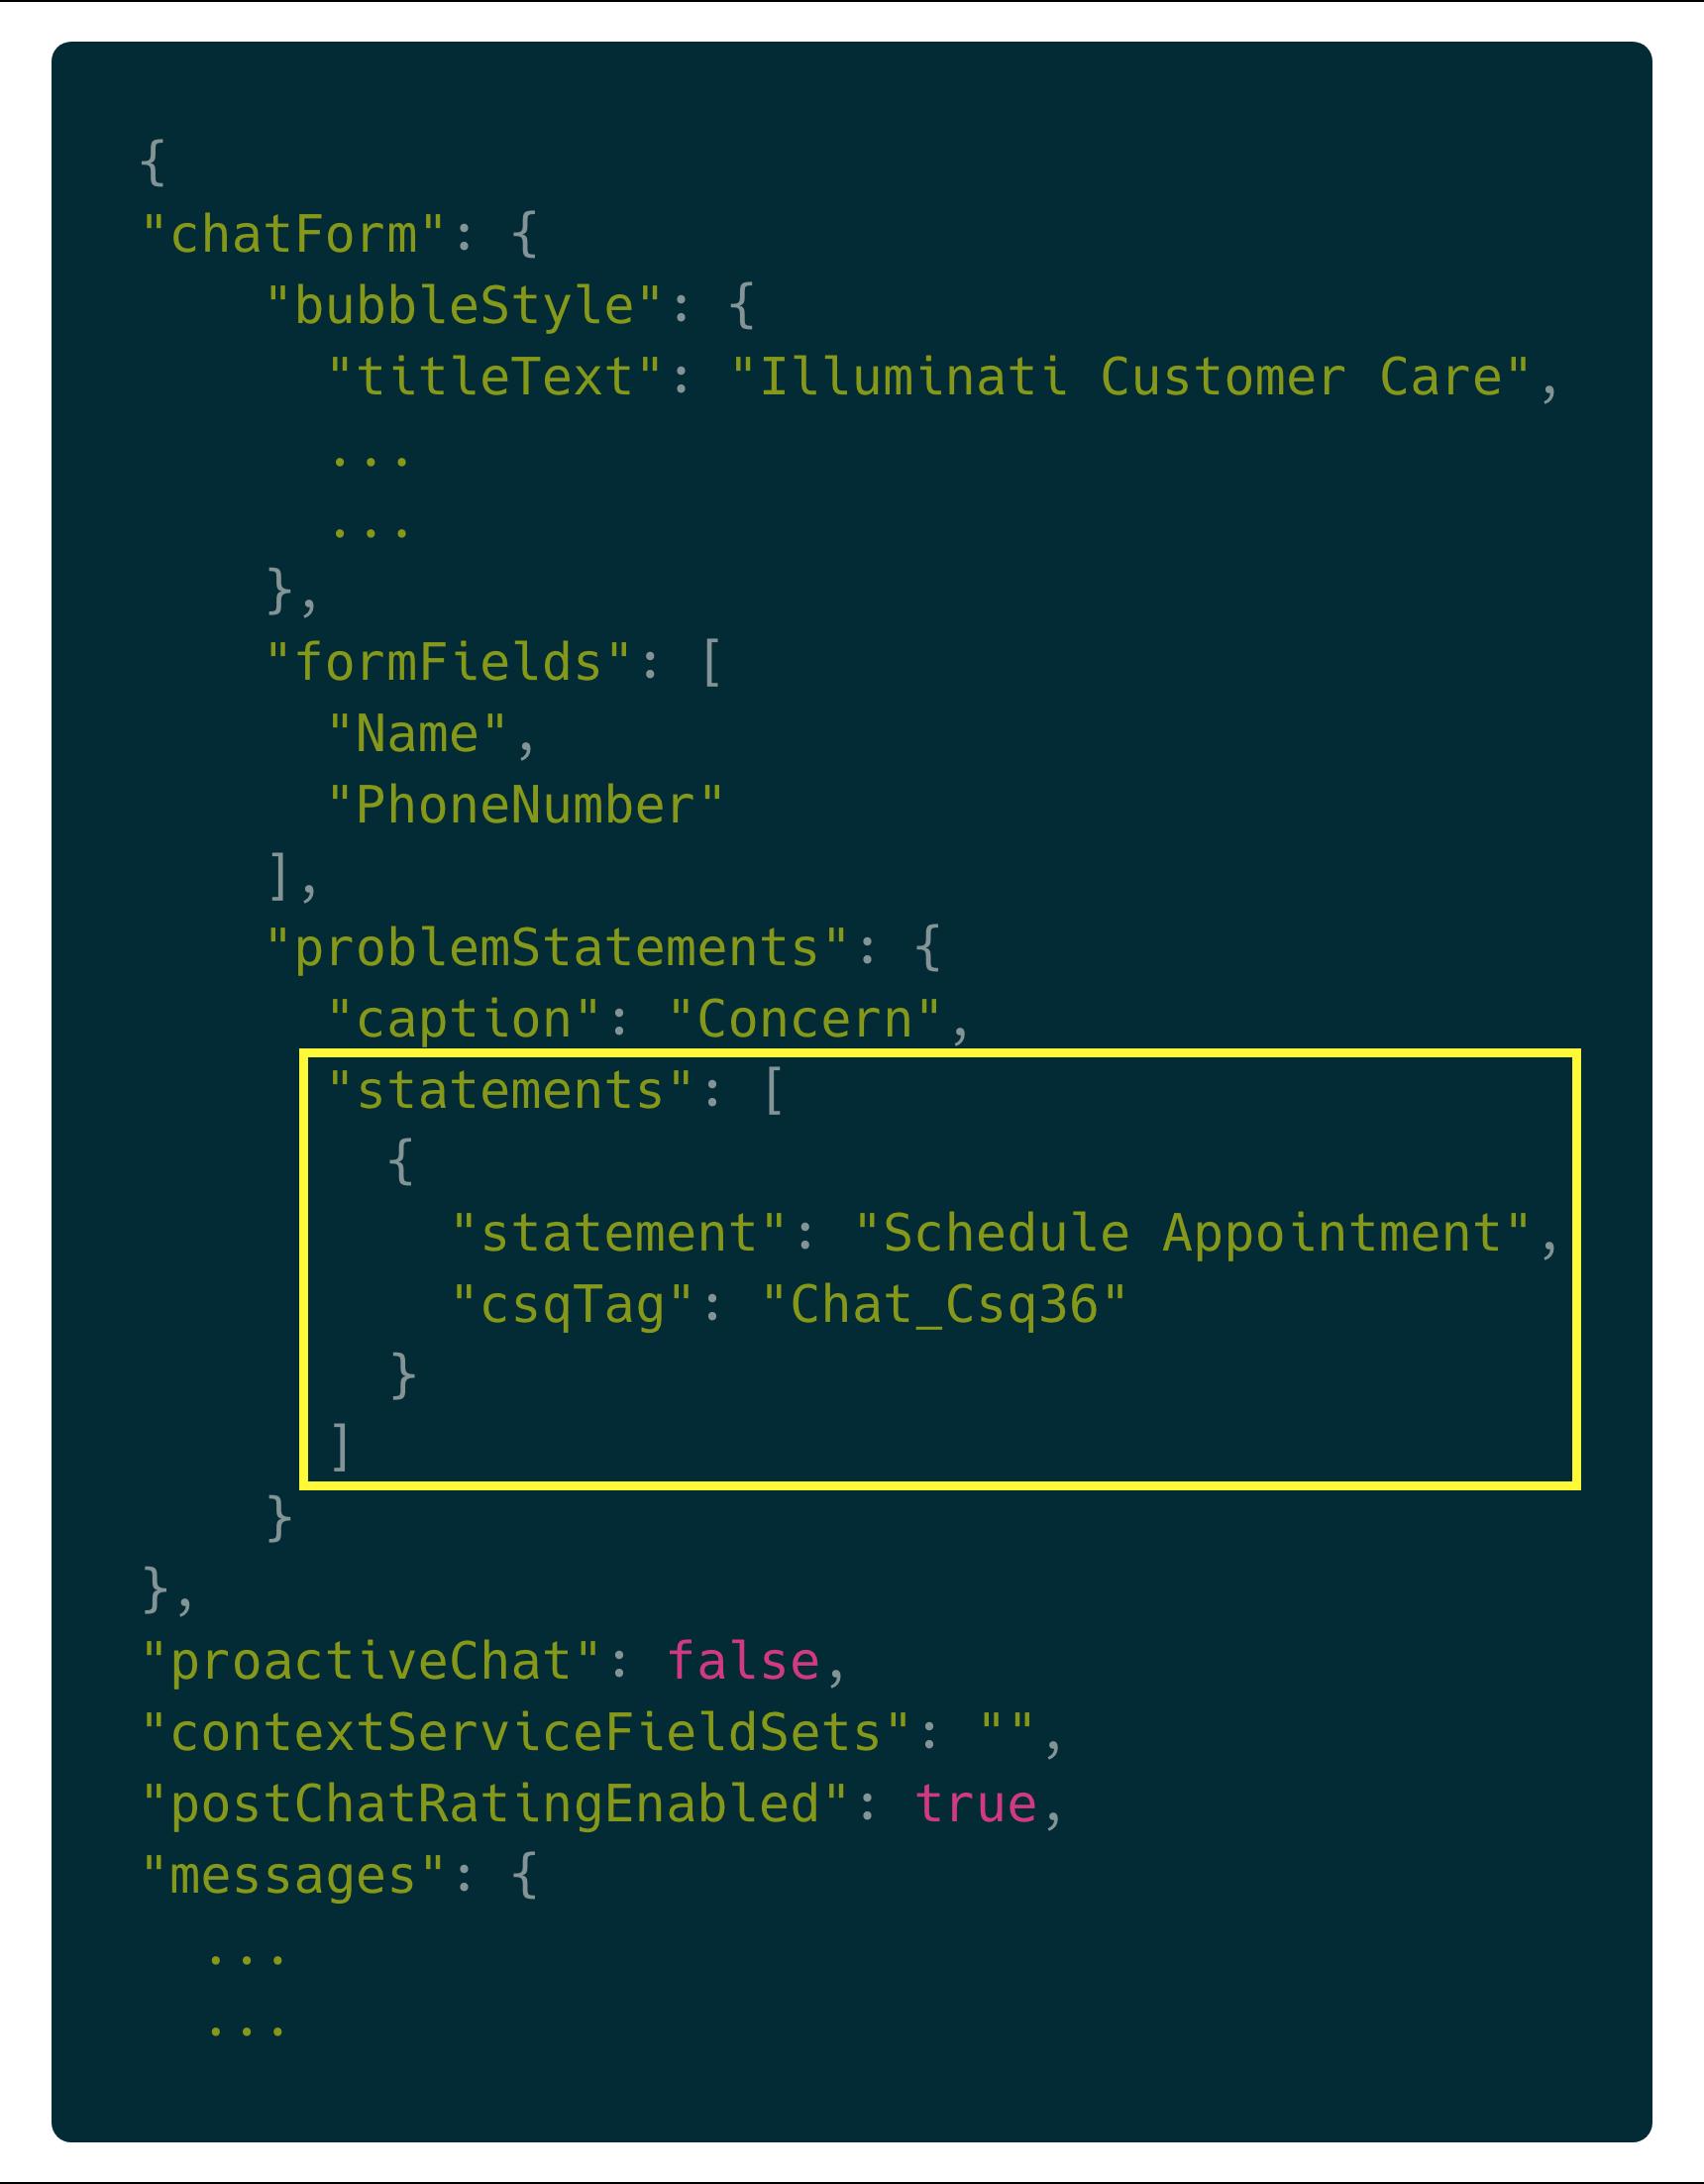 socialminer-sample-code/customer-chat at master · CiscoDevNet